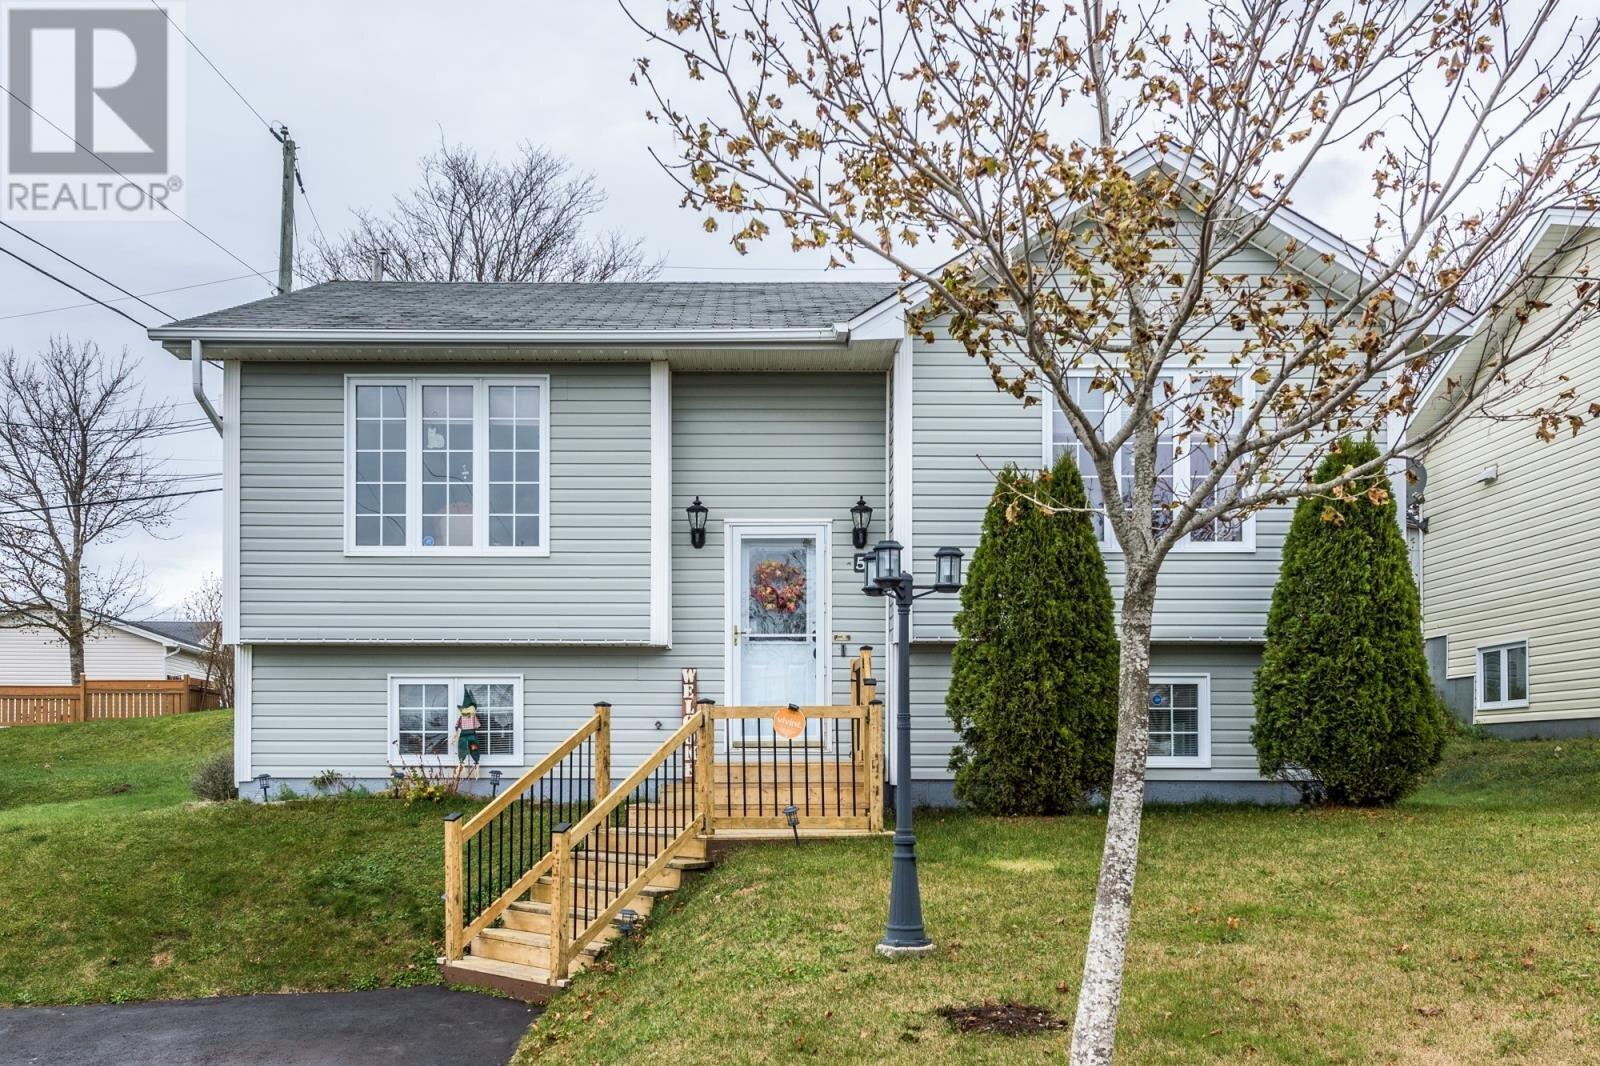 House for sale at 5 Balnafad Pl St. John's Newfoundland - MLS: 1223369